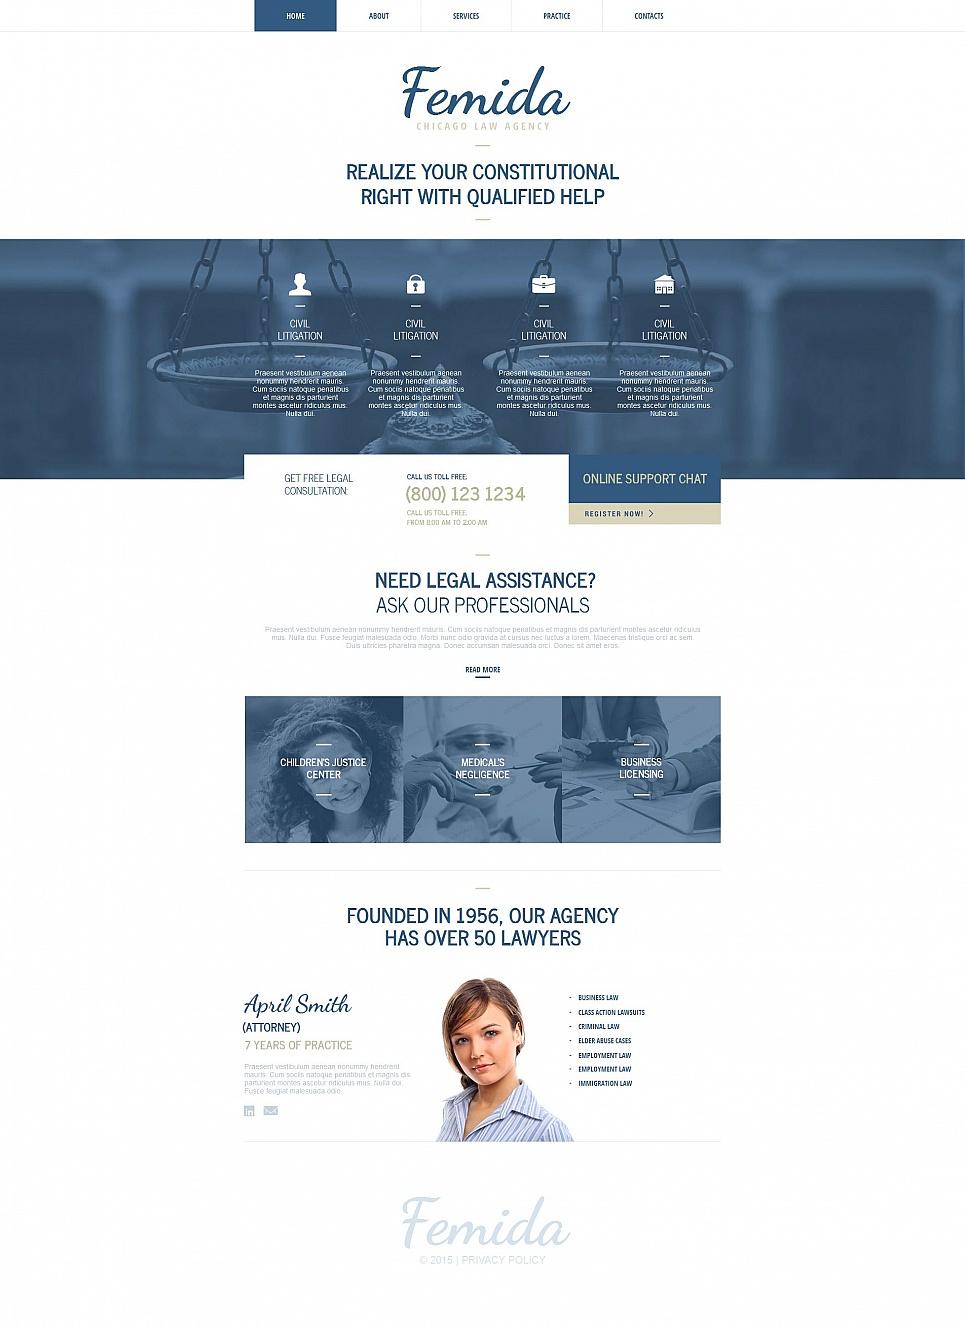 MotoCMS HTML Vorlage #54680 aus der Kategorie Rechtswesen - image